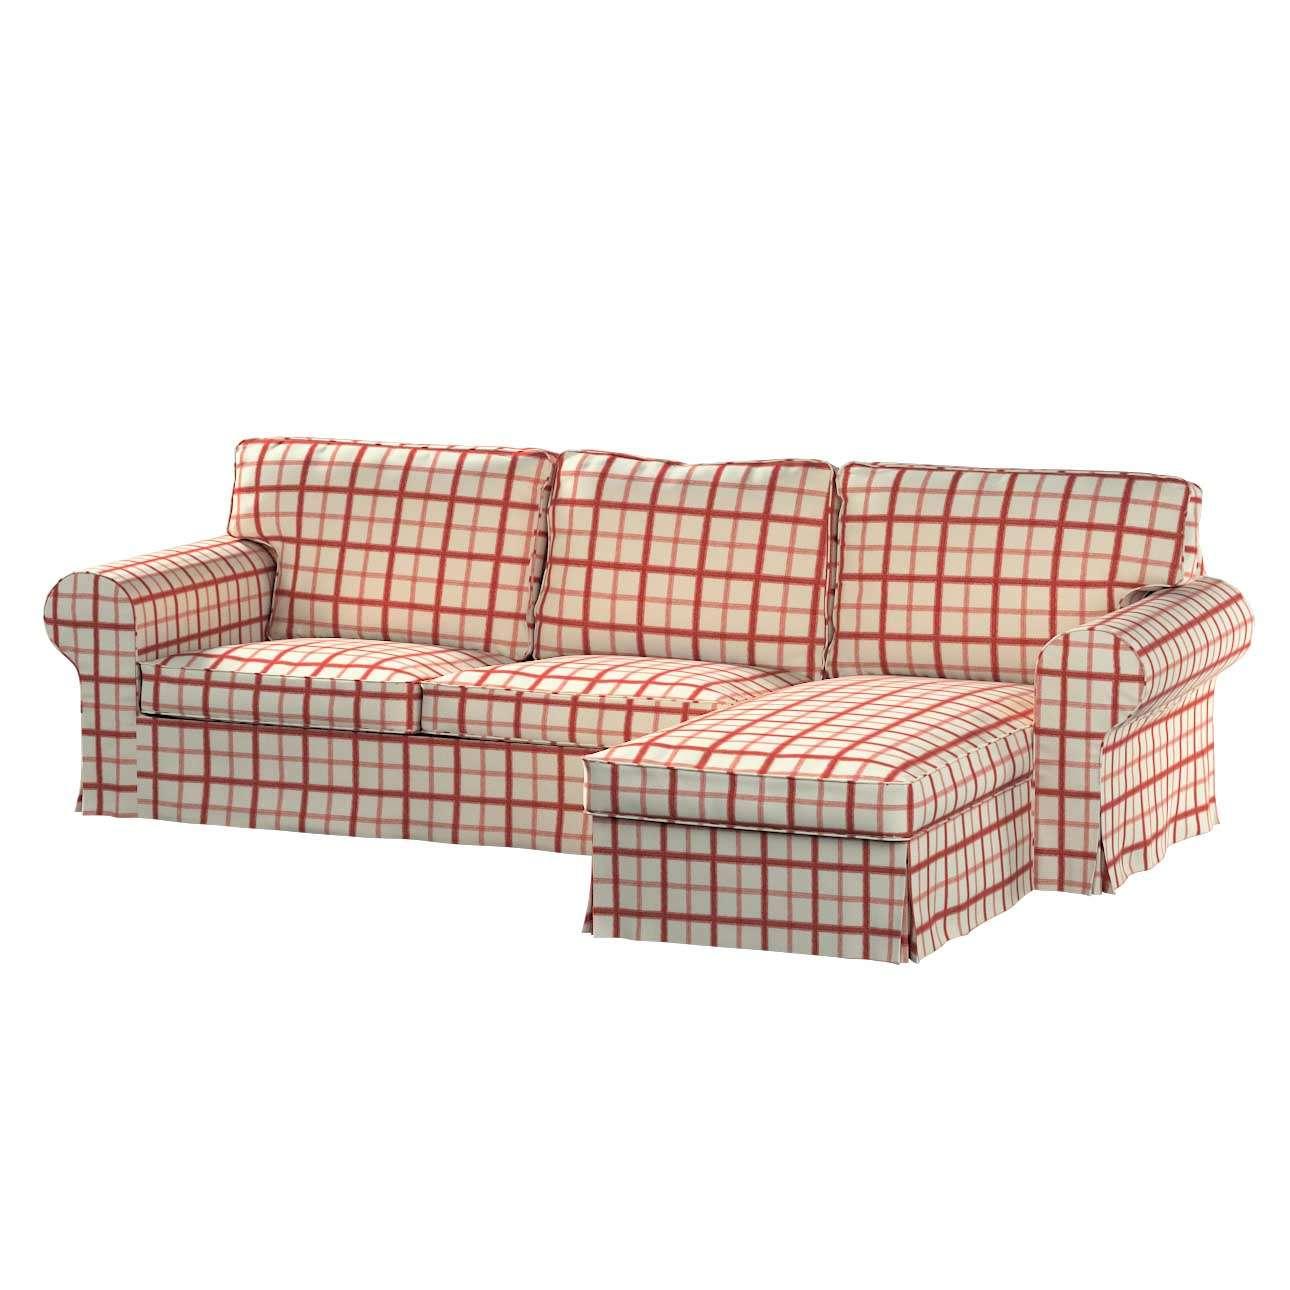 Ektorp 2-Sitzer Sofabezug mit Recamiere Ektorp 2-Sitzer Sofabezug mit Recamiere von der Kollektion Avinon, Stoff: 131-15